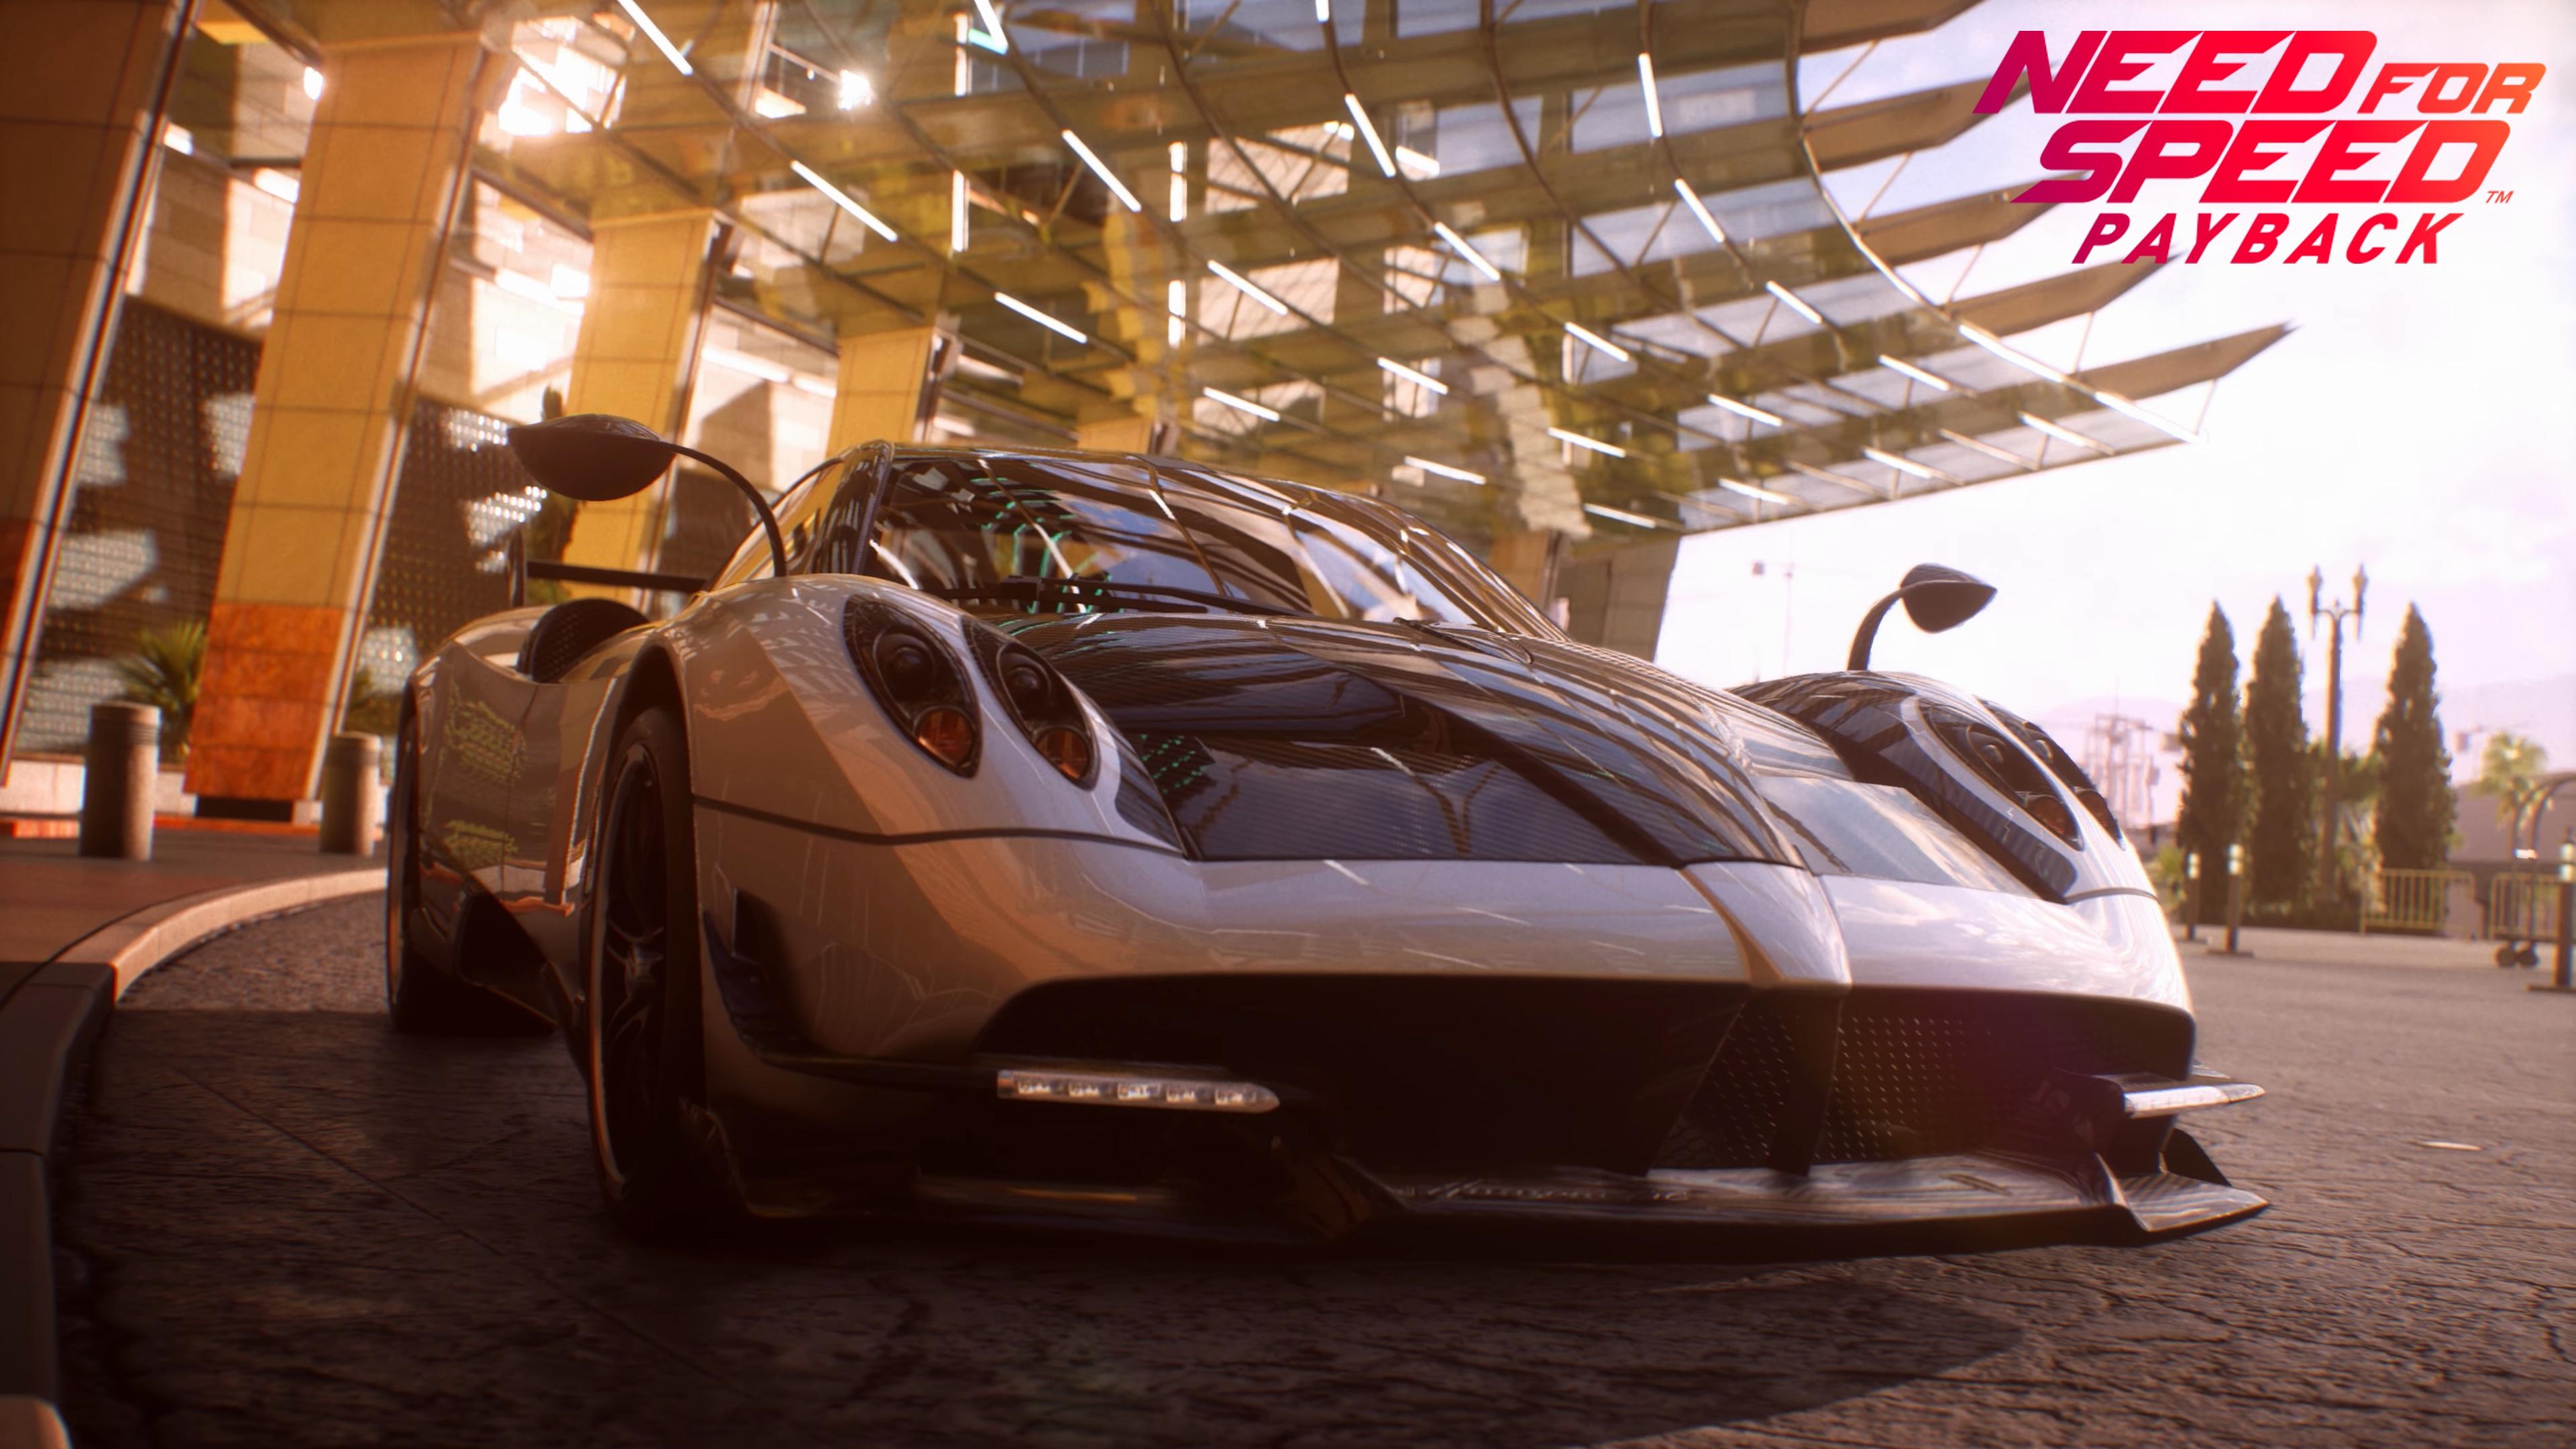 Need for Speed Payback: Автомобілі, Need For Speed, Need for Speed Payback, Pagani, Pagani Huayra BC